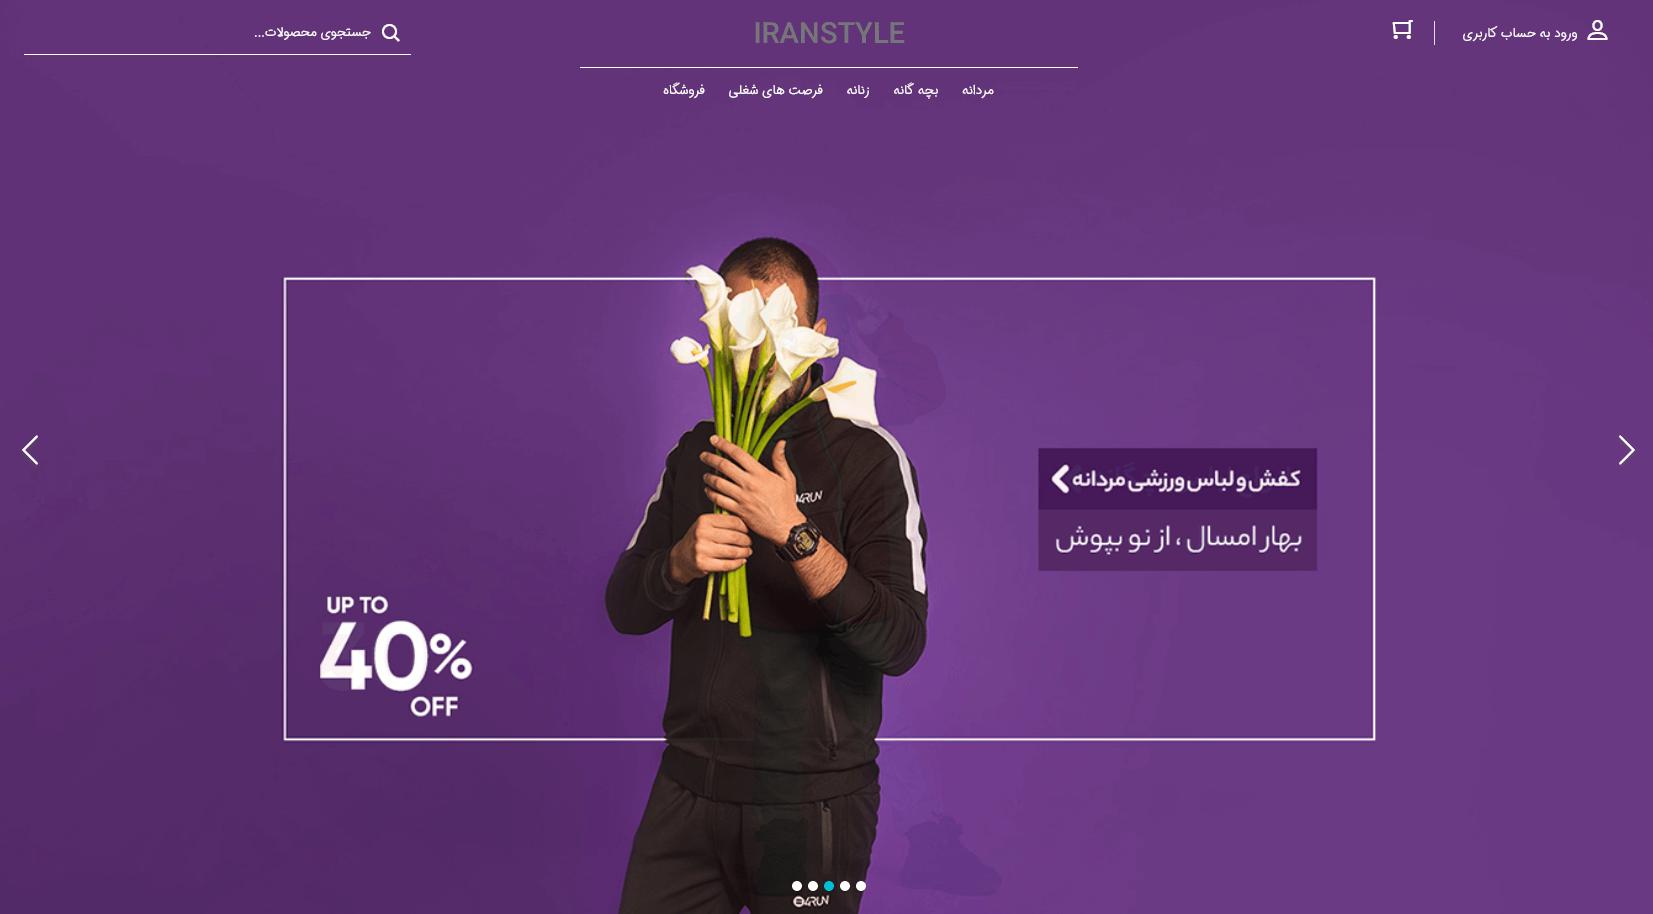 Screenshot_2020-08-22 فروشگاه اینترنتی لباس ایراناستایل – هر آنچه که نیاز دارید با بهترین قیمت از ایراناستایل بخرید (1)